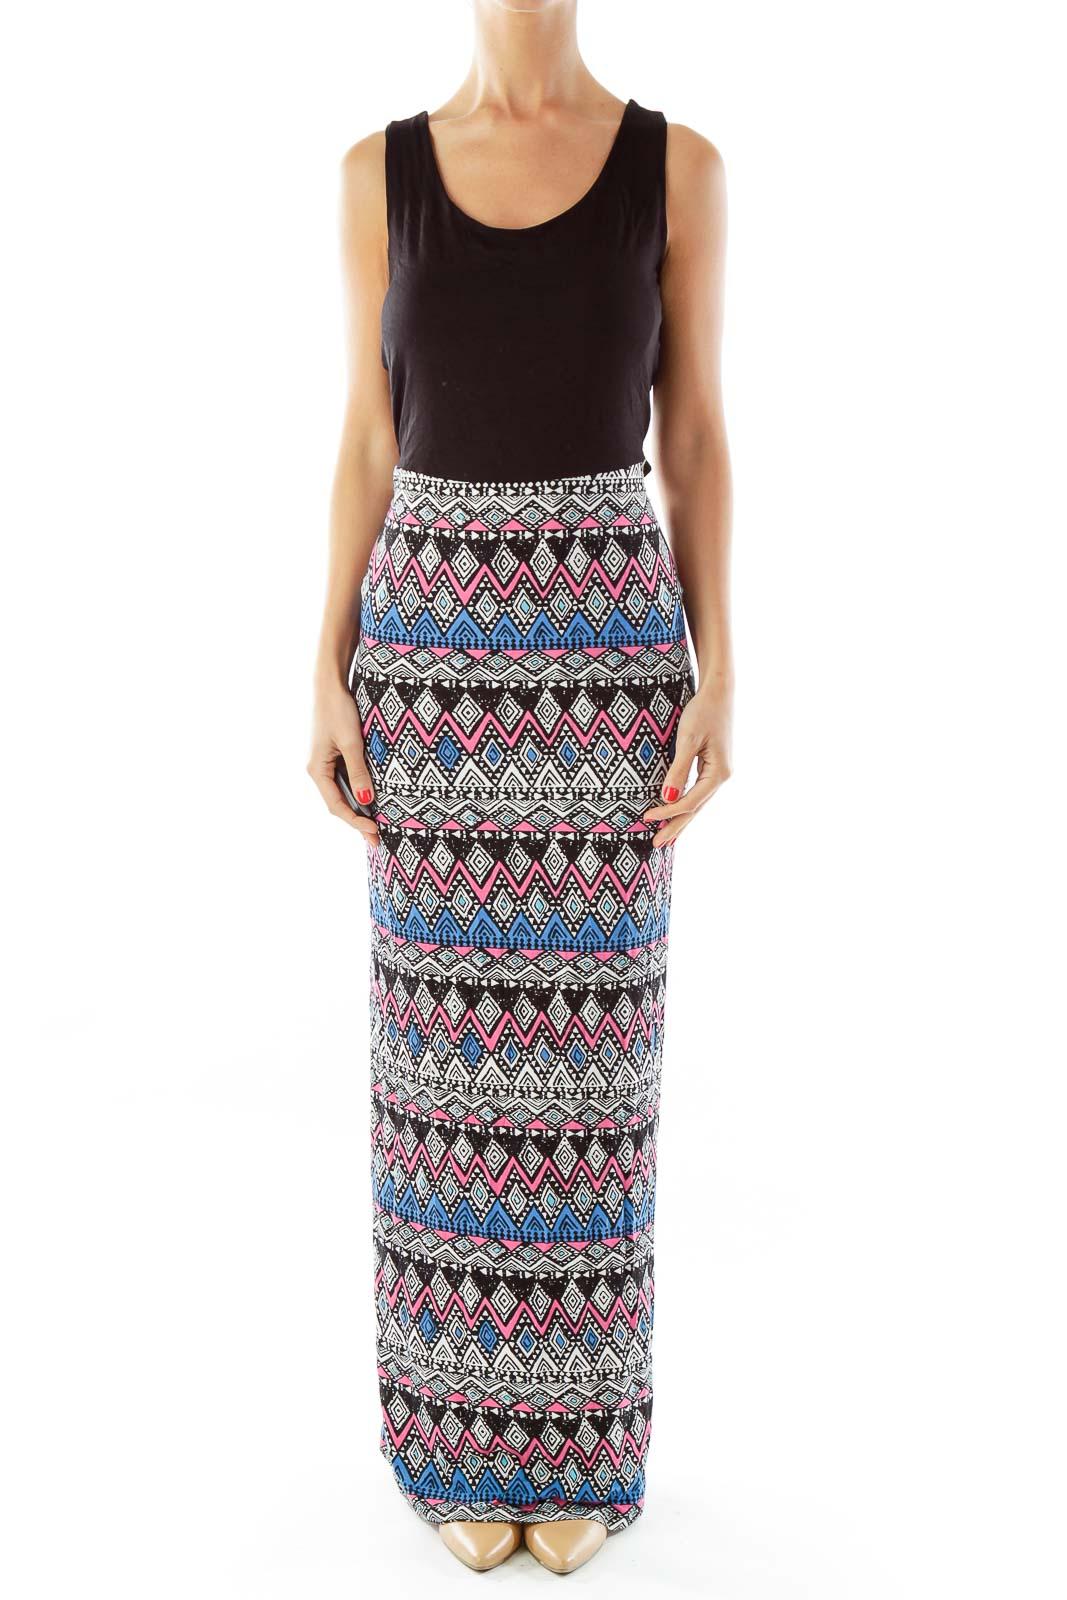 Black & Multicolor Tribal Print Maxi Dress Front